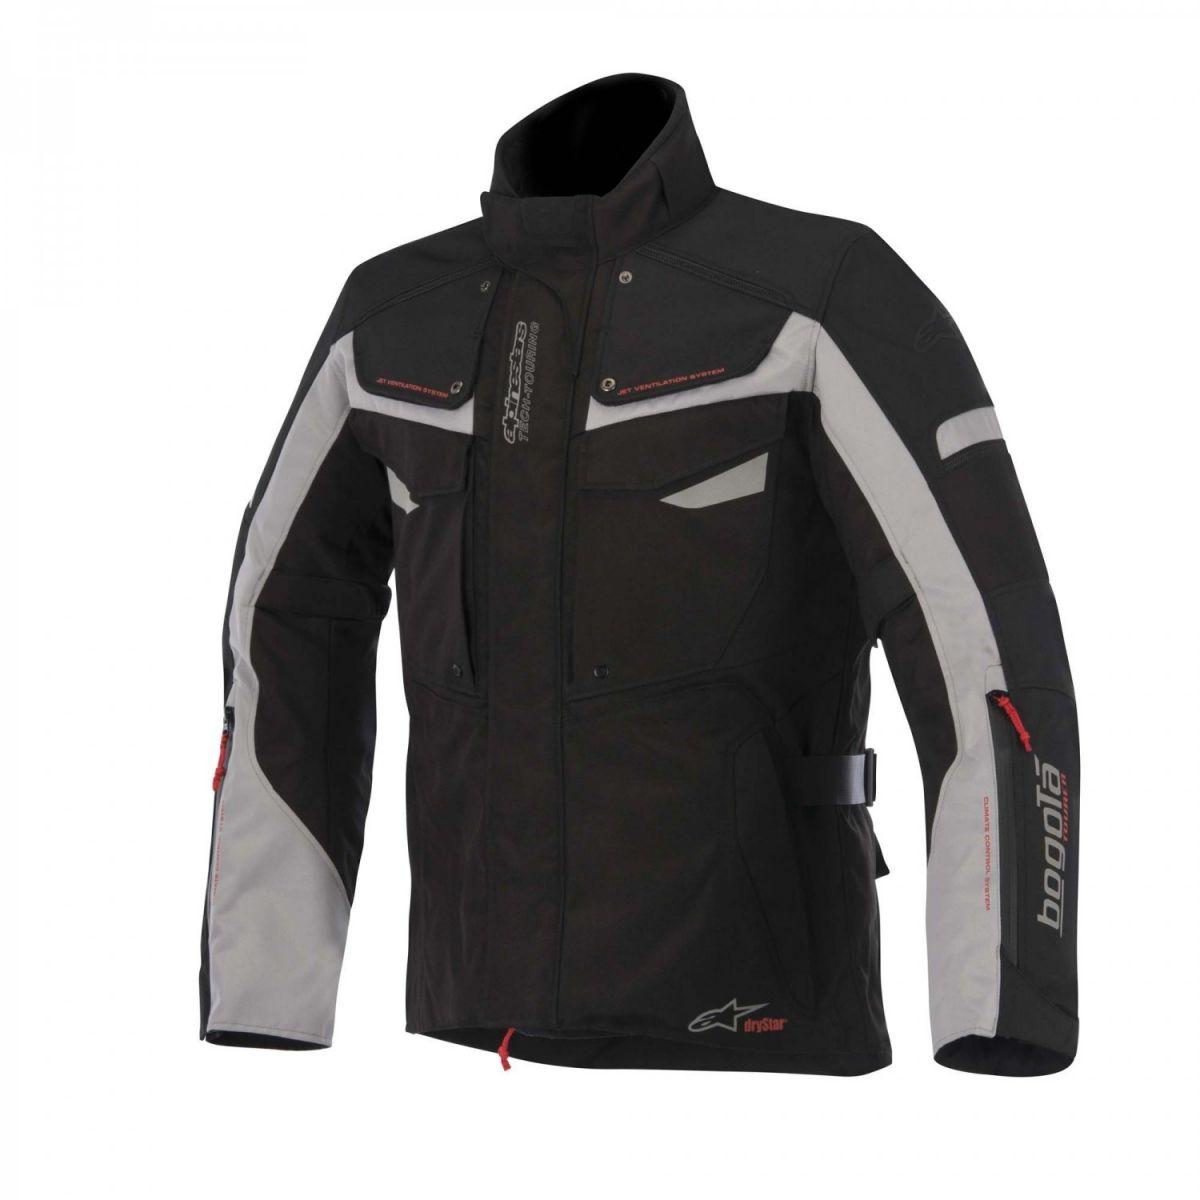 Jaqueta Alpinestars Bogotá Drystar® WP Preta e Cinza (COMPRE JUNTO!) para Big Trail  - Super Bike - Loja Oficial Alpinestars